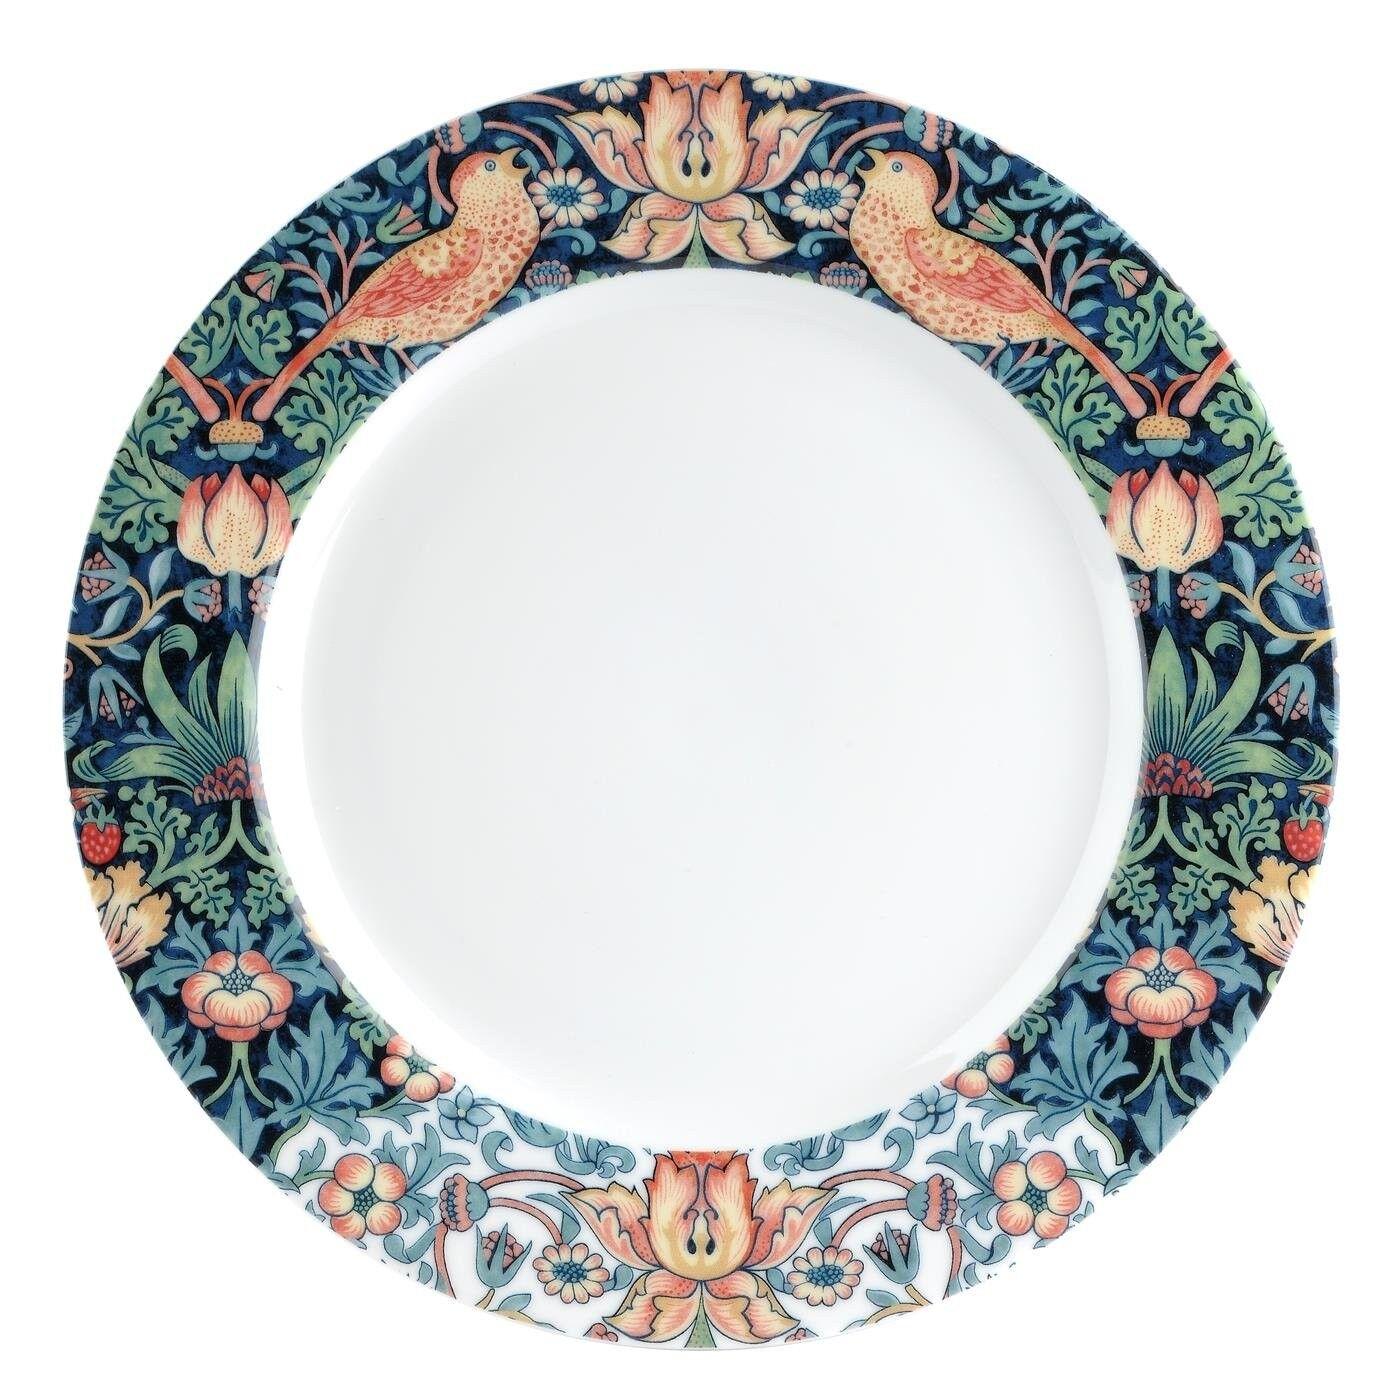 Spode Strawberry Thief Dinner Plate, 27 cm